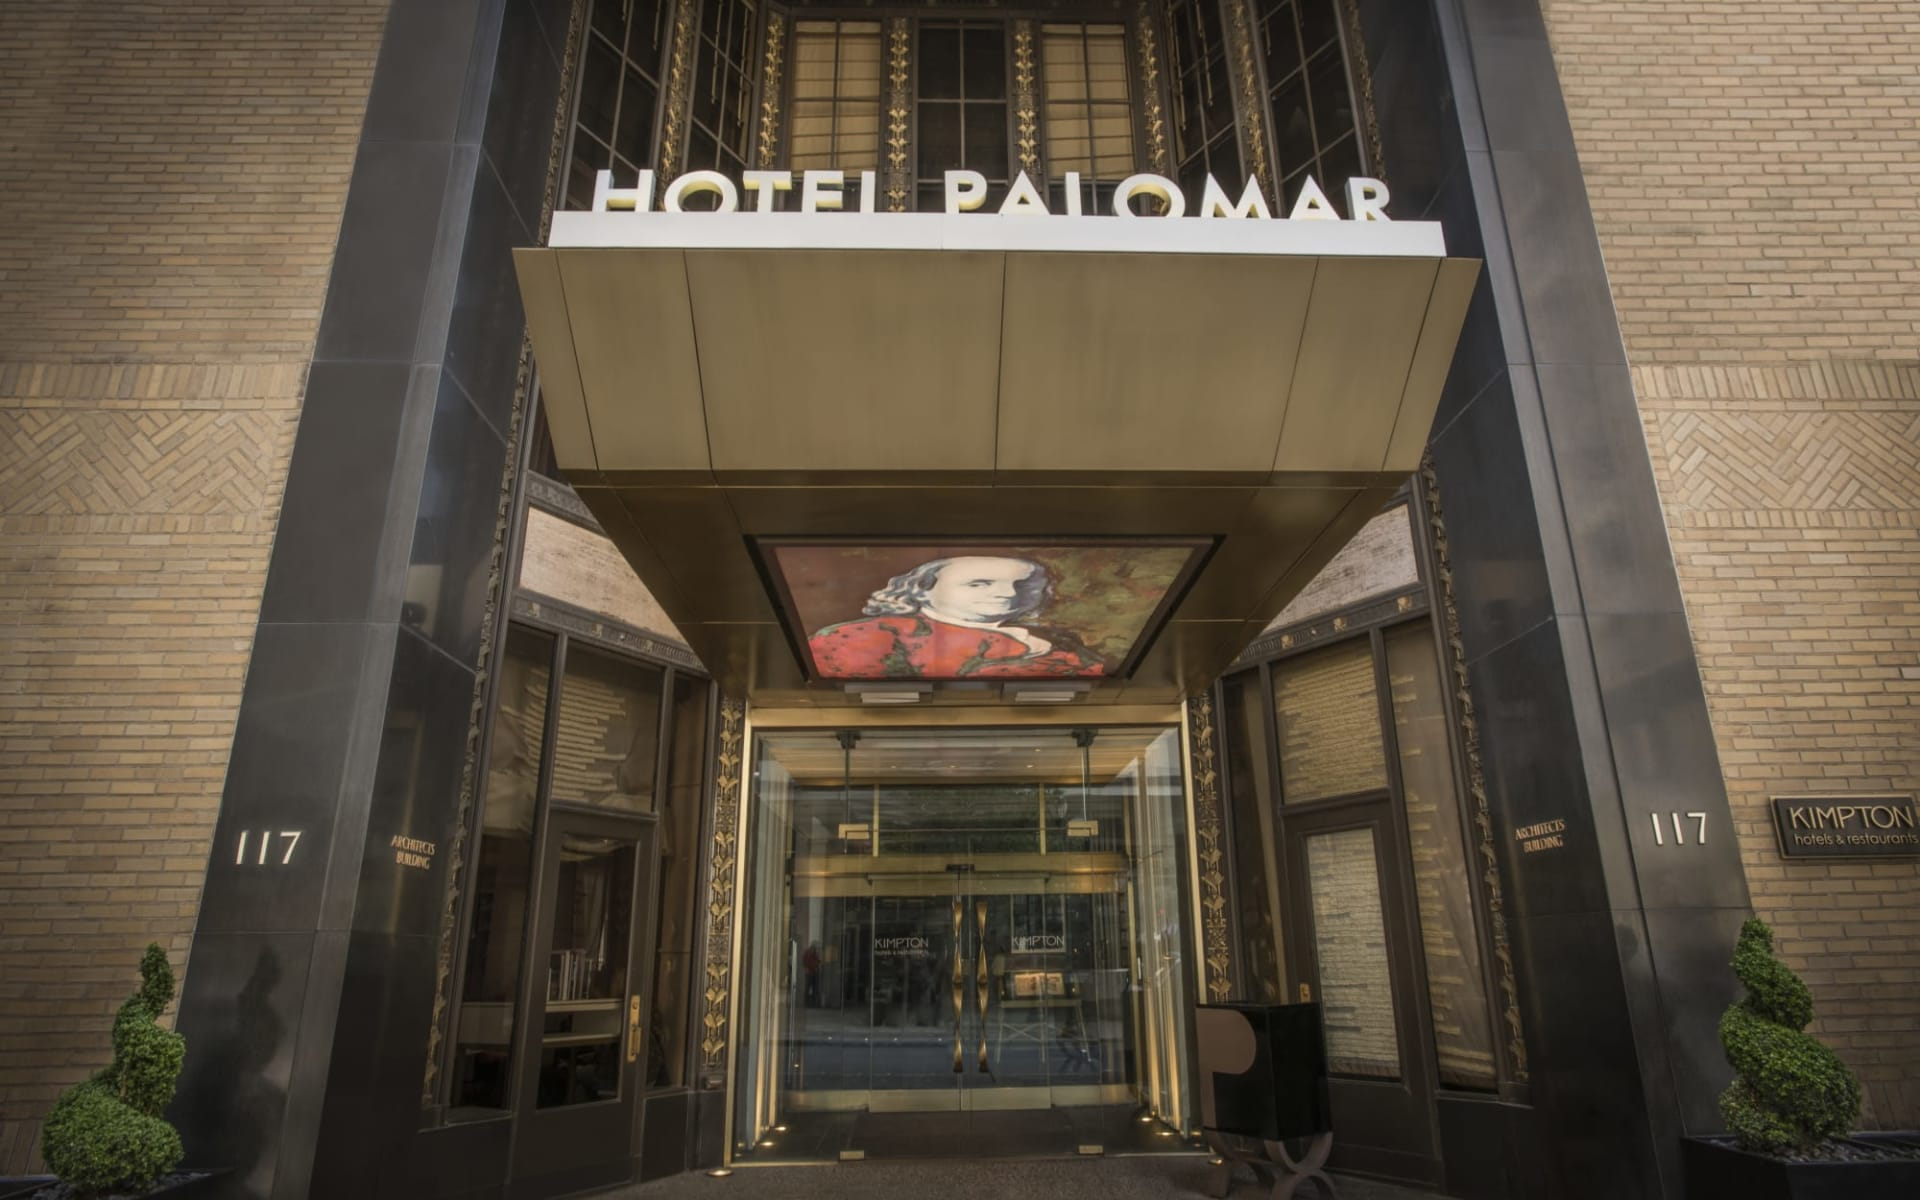 Hotel Palomar Philadelphia: php_ex_003